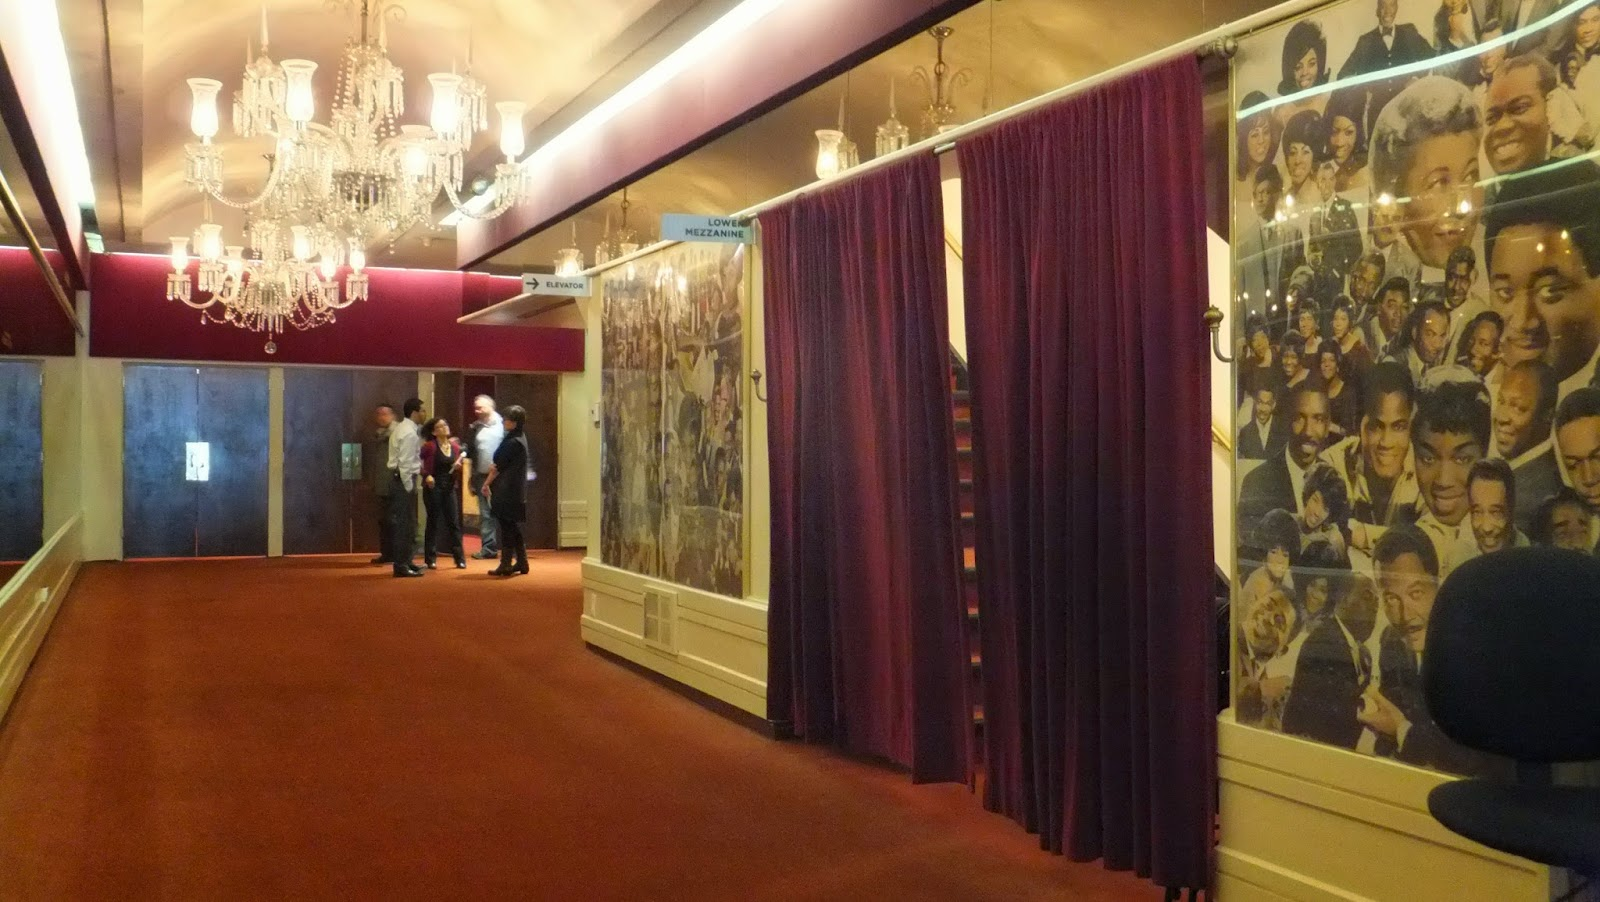 Apollo Theater, Harlem, Manhattan, New York, Elisa N, Blog de Viajes, Lifestyle, Travel